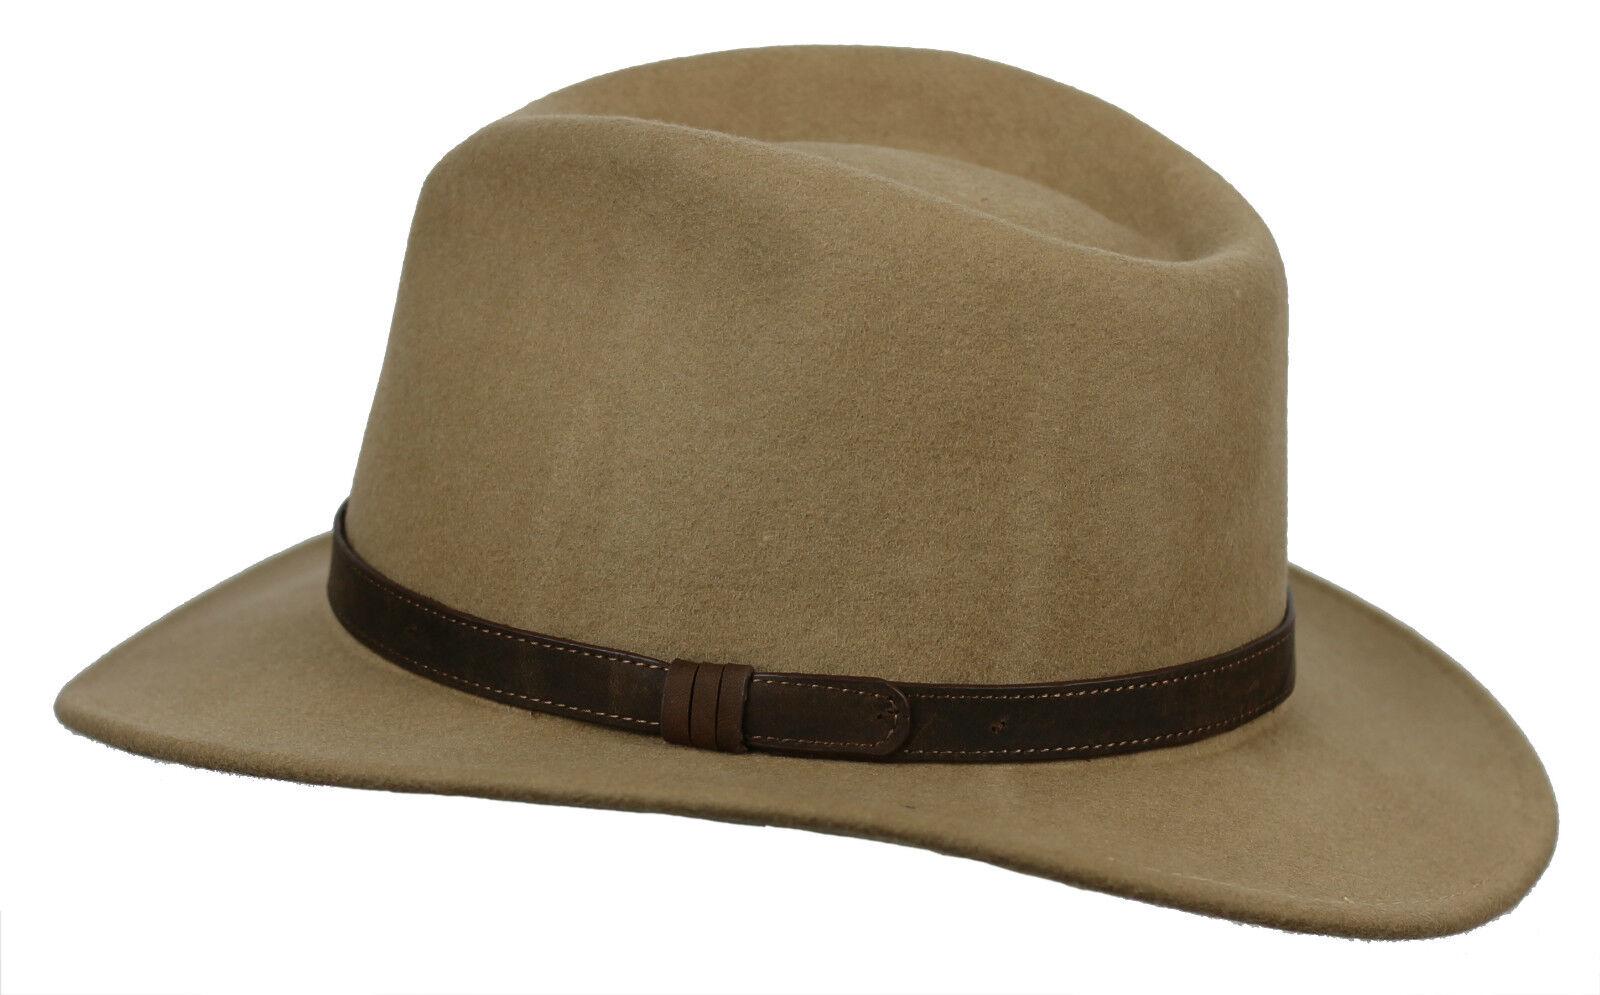 Unisex Mens damen Vintage 100% Felt Wool Wide Brim Crushable Fedora Hat 4 Größes  | Deutsche Outlets